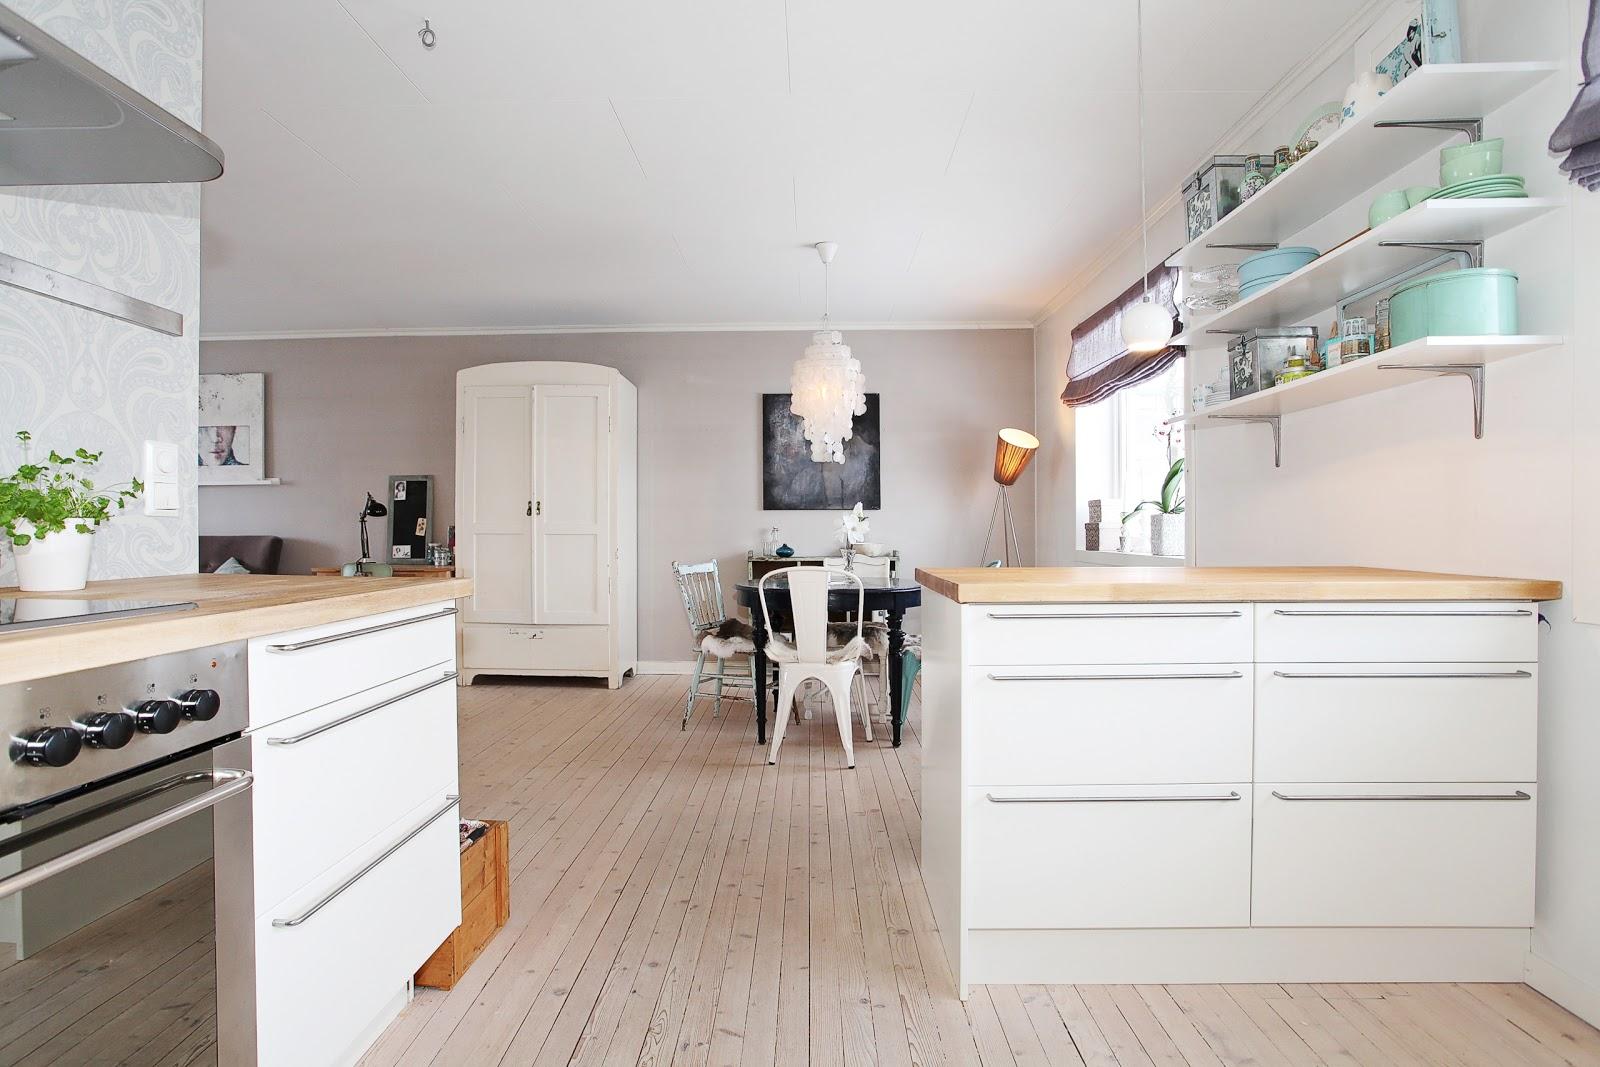 clementine kj kkenet v rt. Black Bedroom Furniture Sets. Home Design Ideas